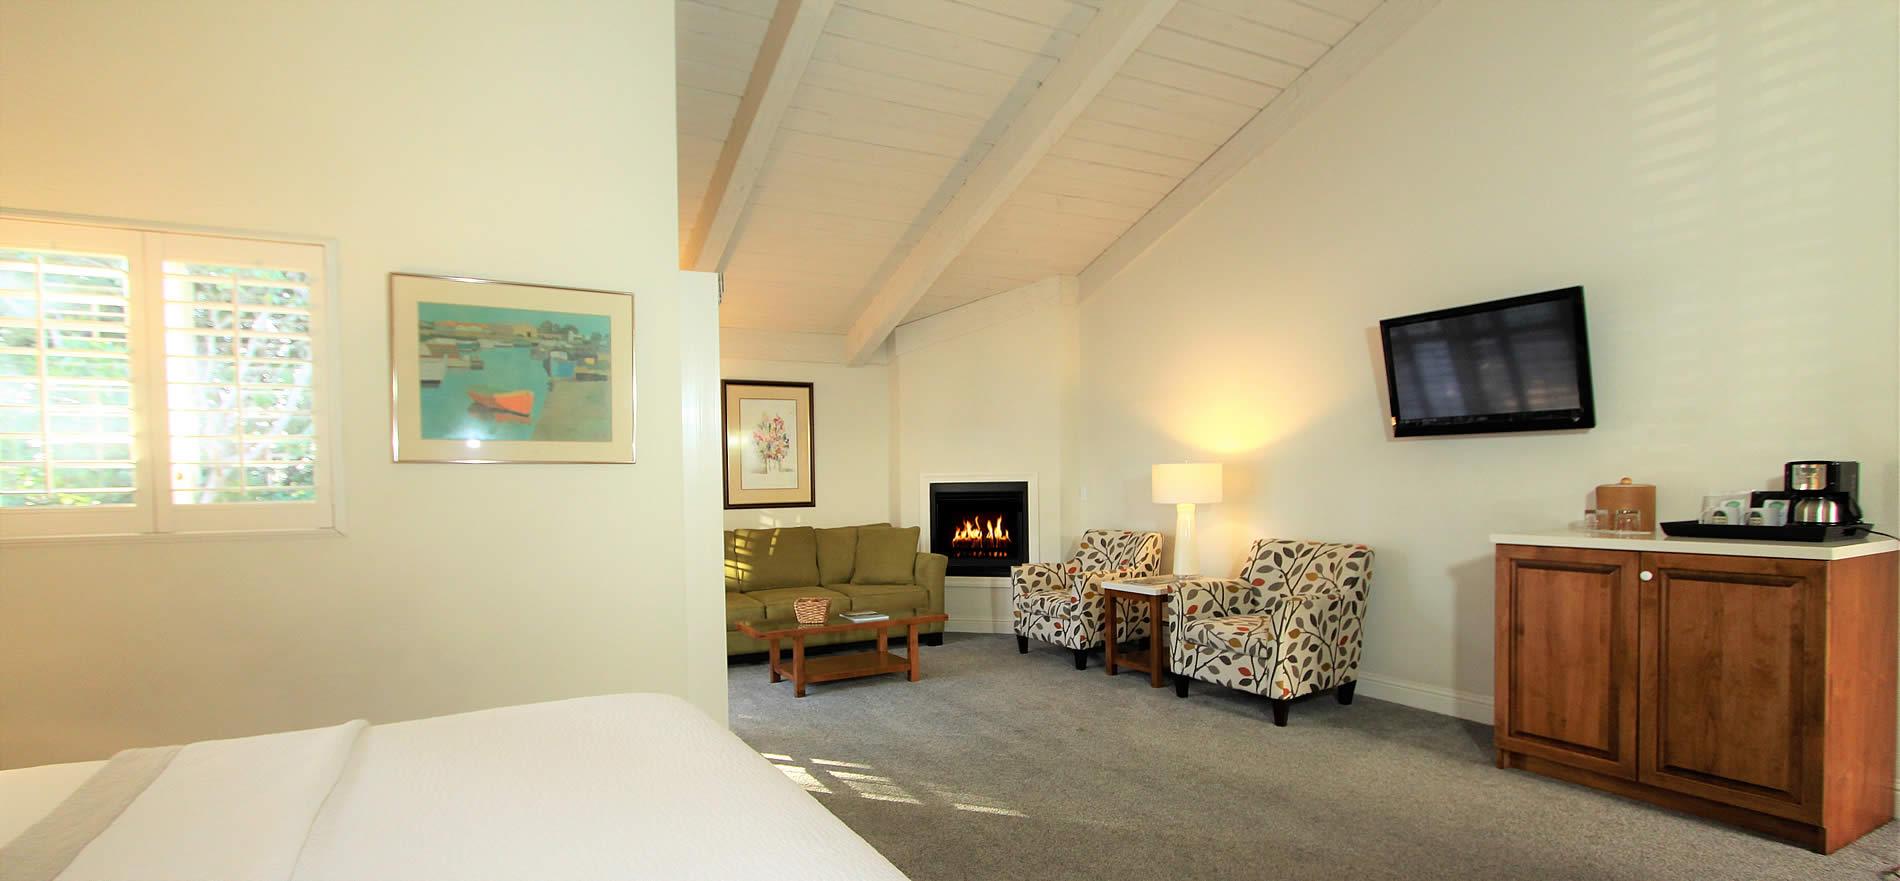 intermediate level king room